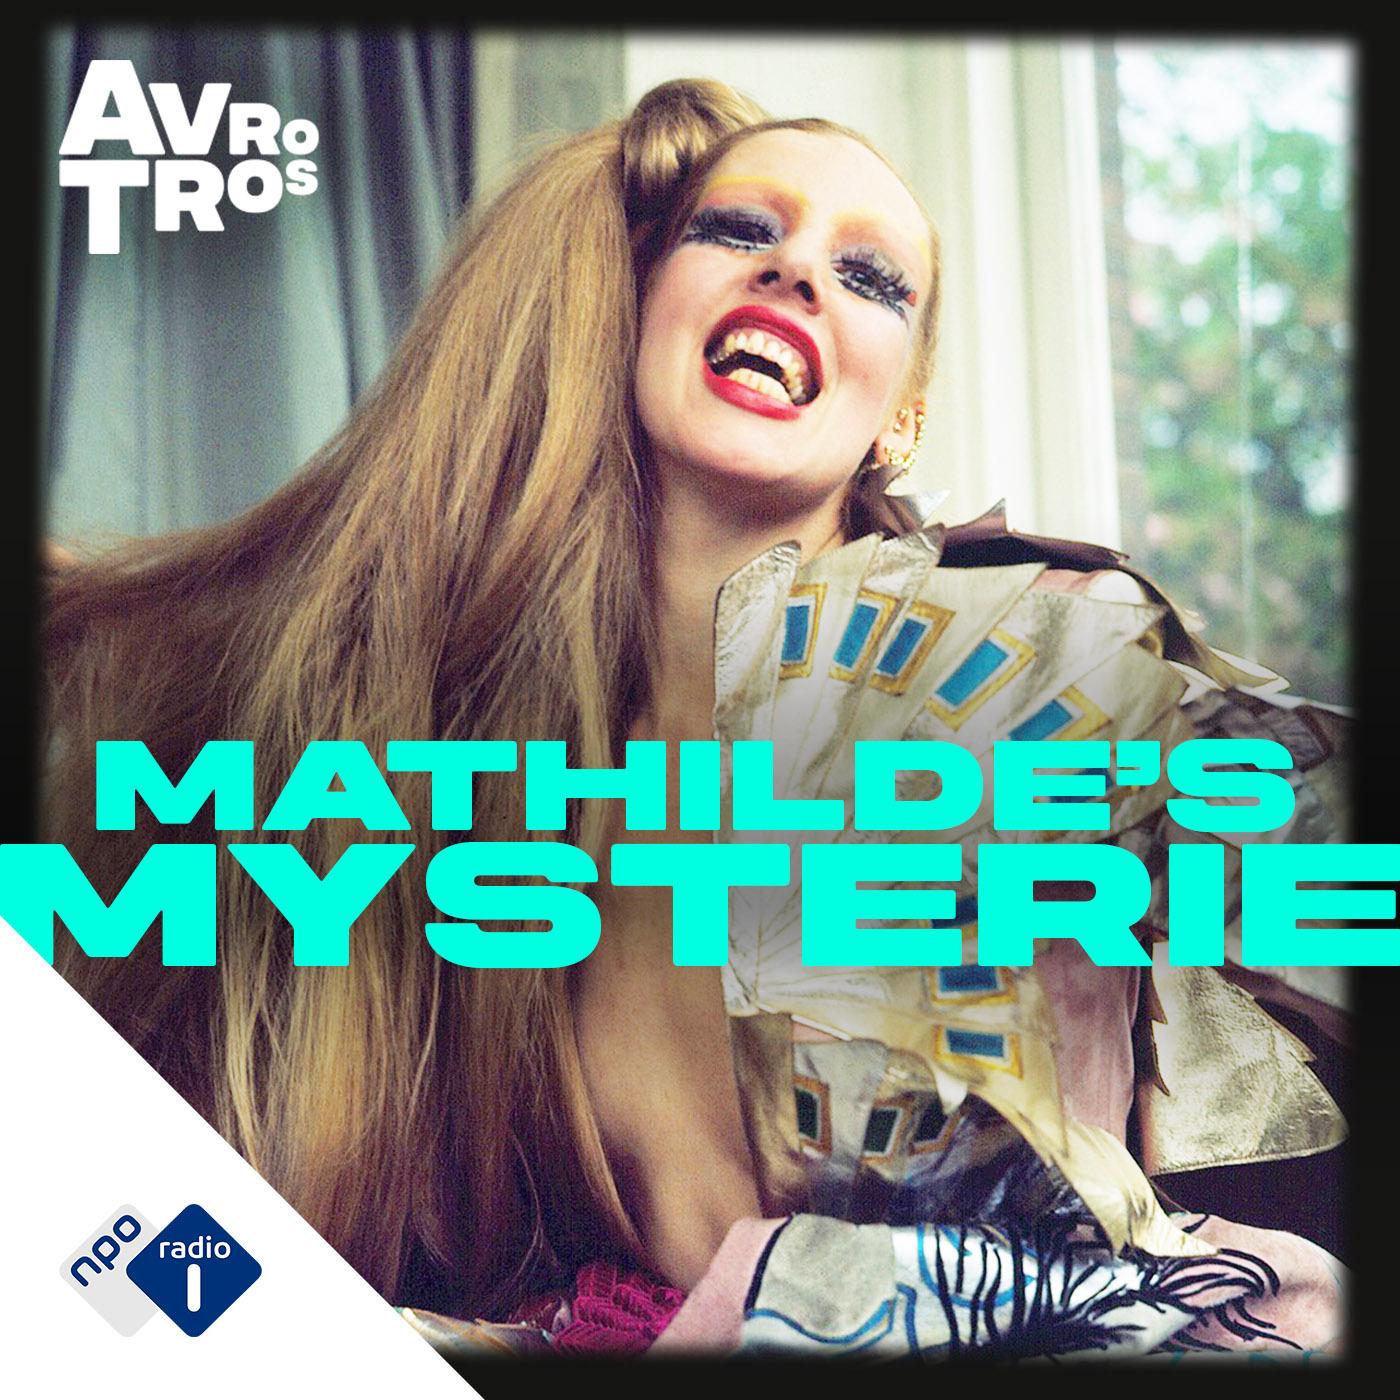 Mathildes Mysterie